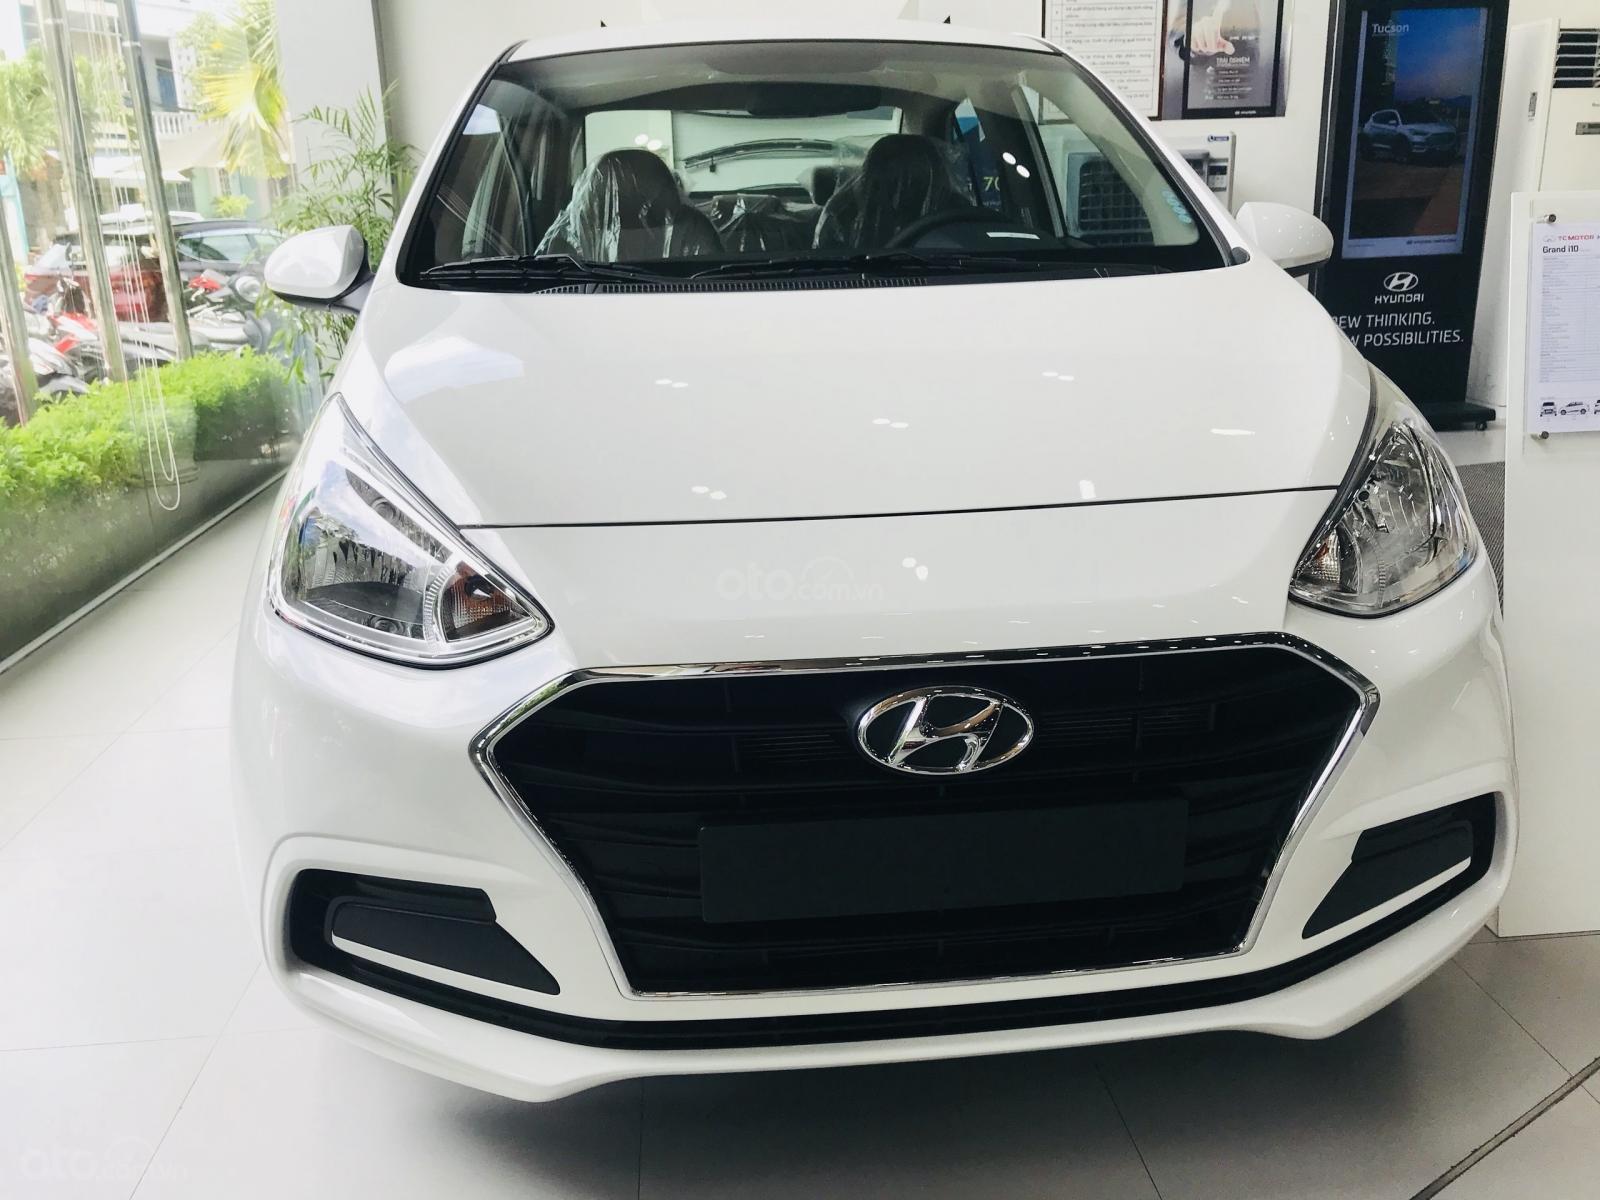 Chỉ 110 triệu sở hữu ngay Hyundai i10 2019, hotline: 0974064605 (3)